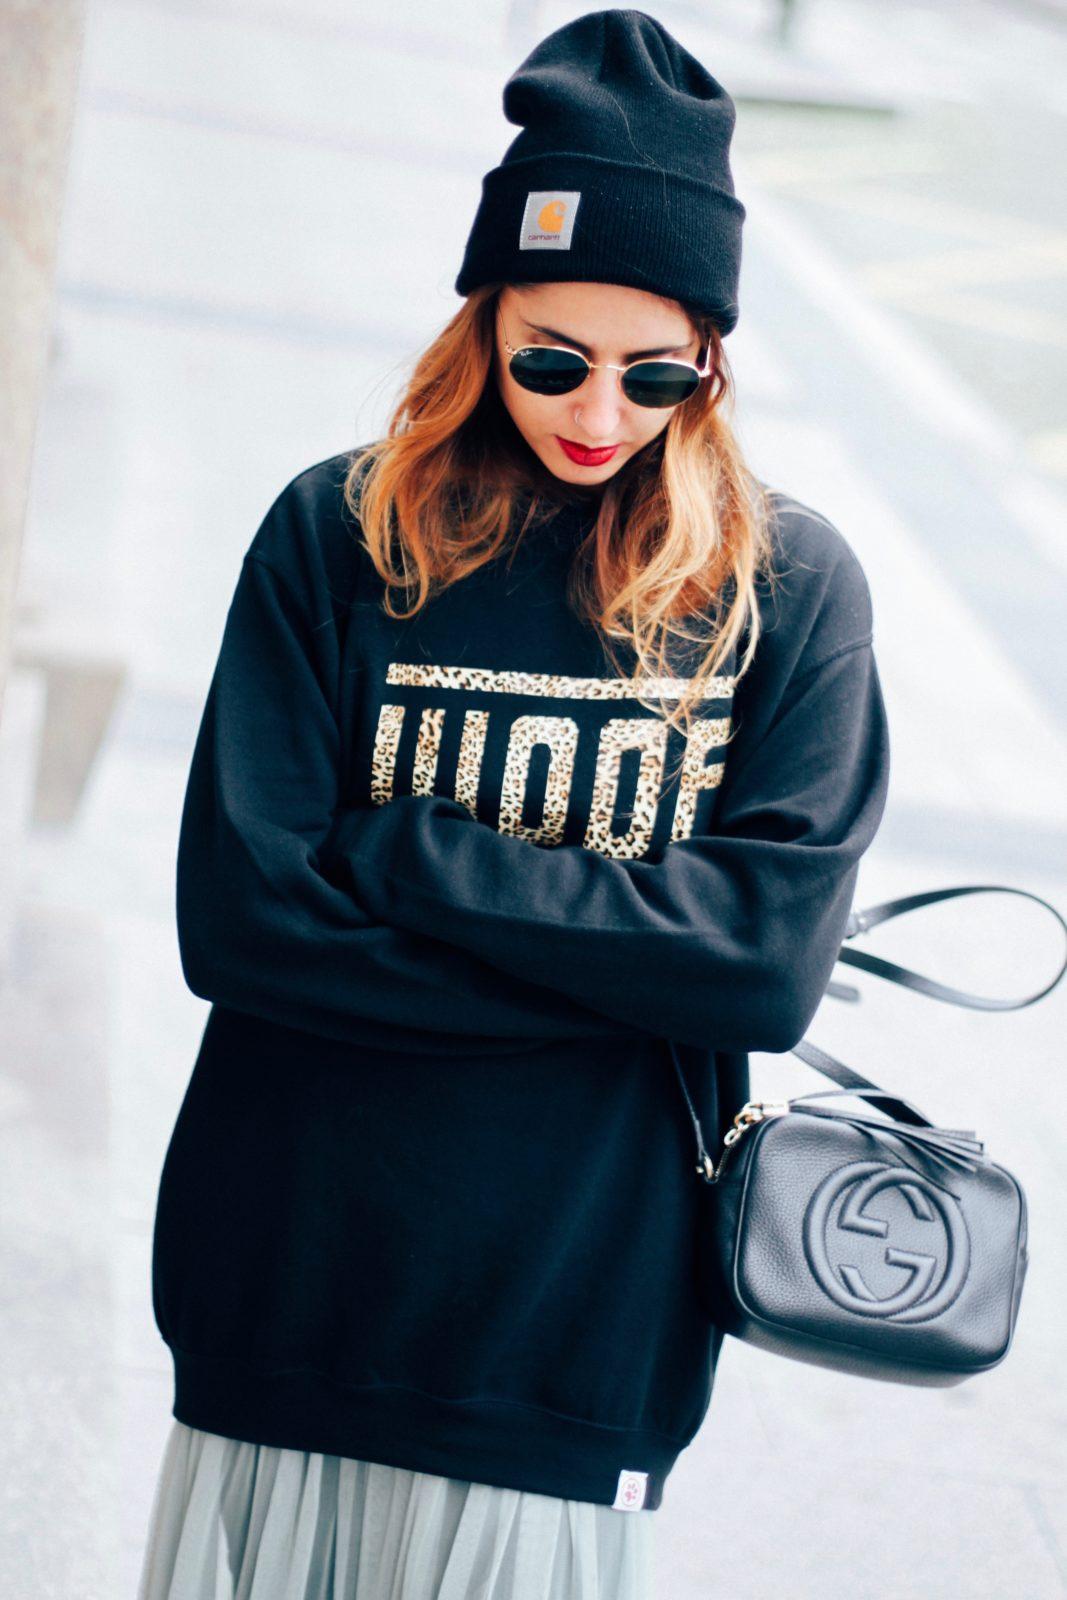 sudadera_old_dogs_falda_de_tul_vans_beanie_carhartt_look_donkeycool_street_style-42